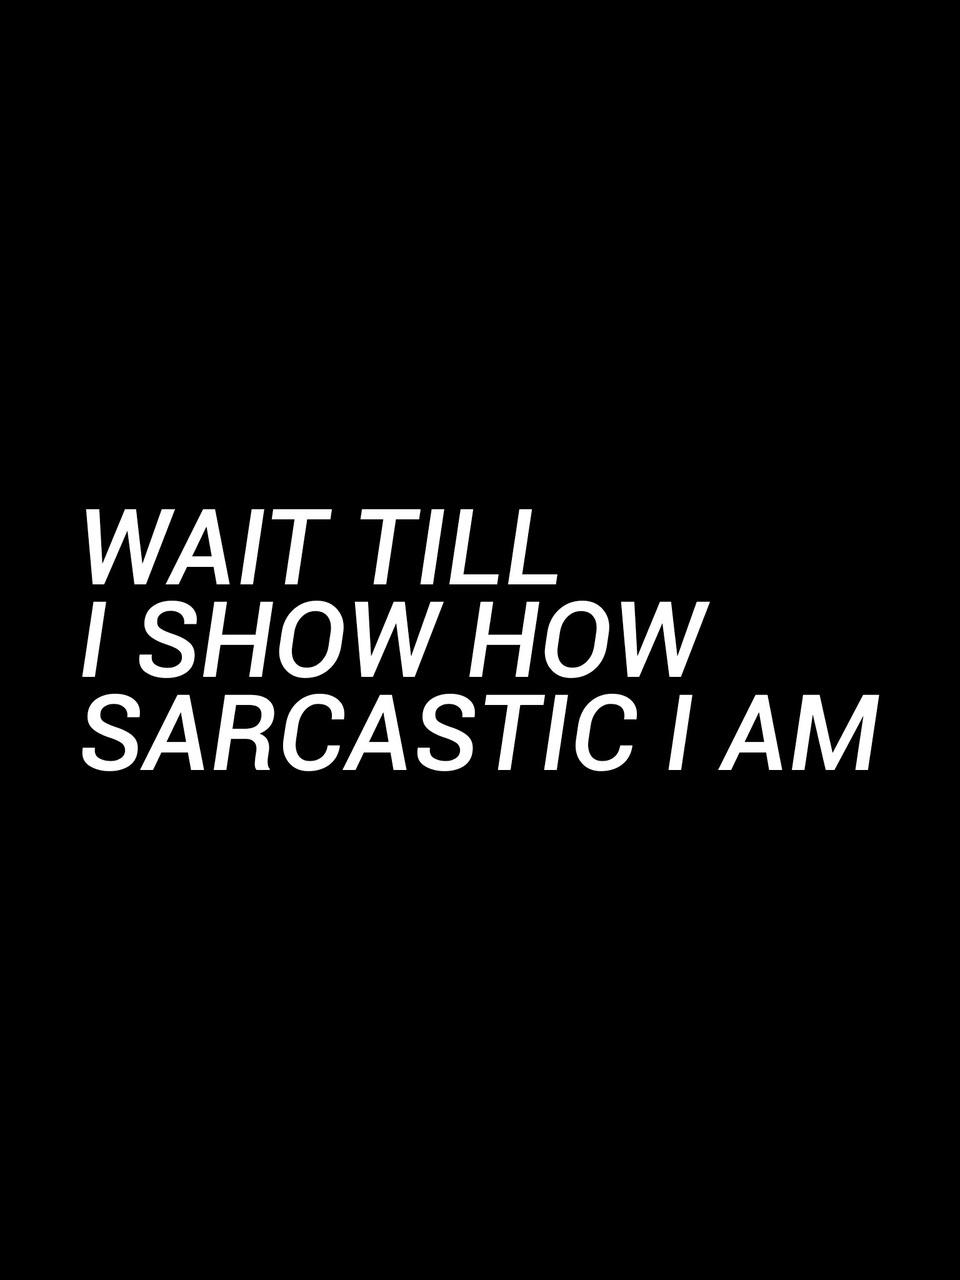 tumblr, emotional, and life image